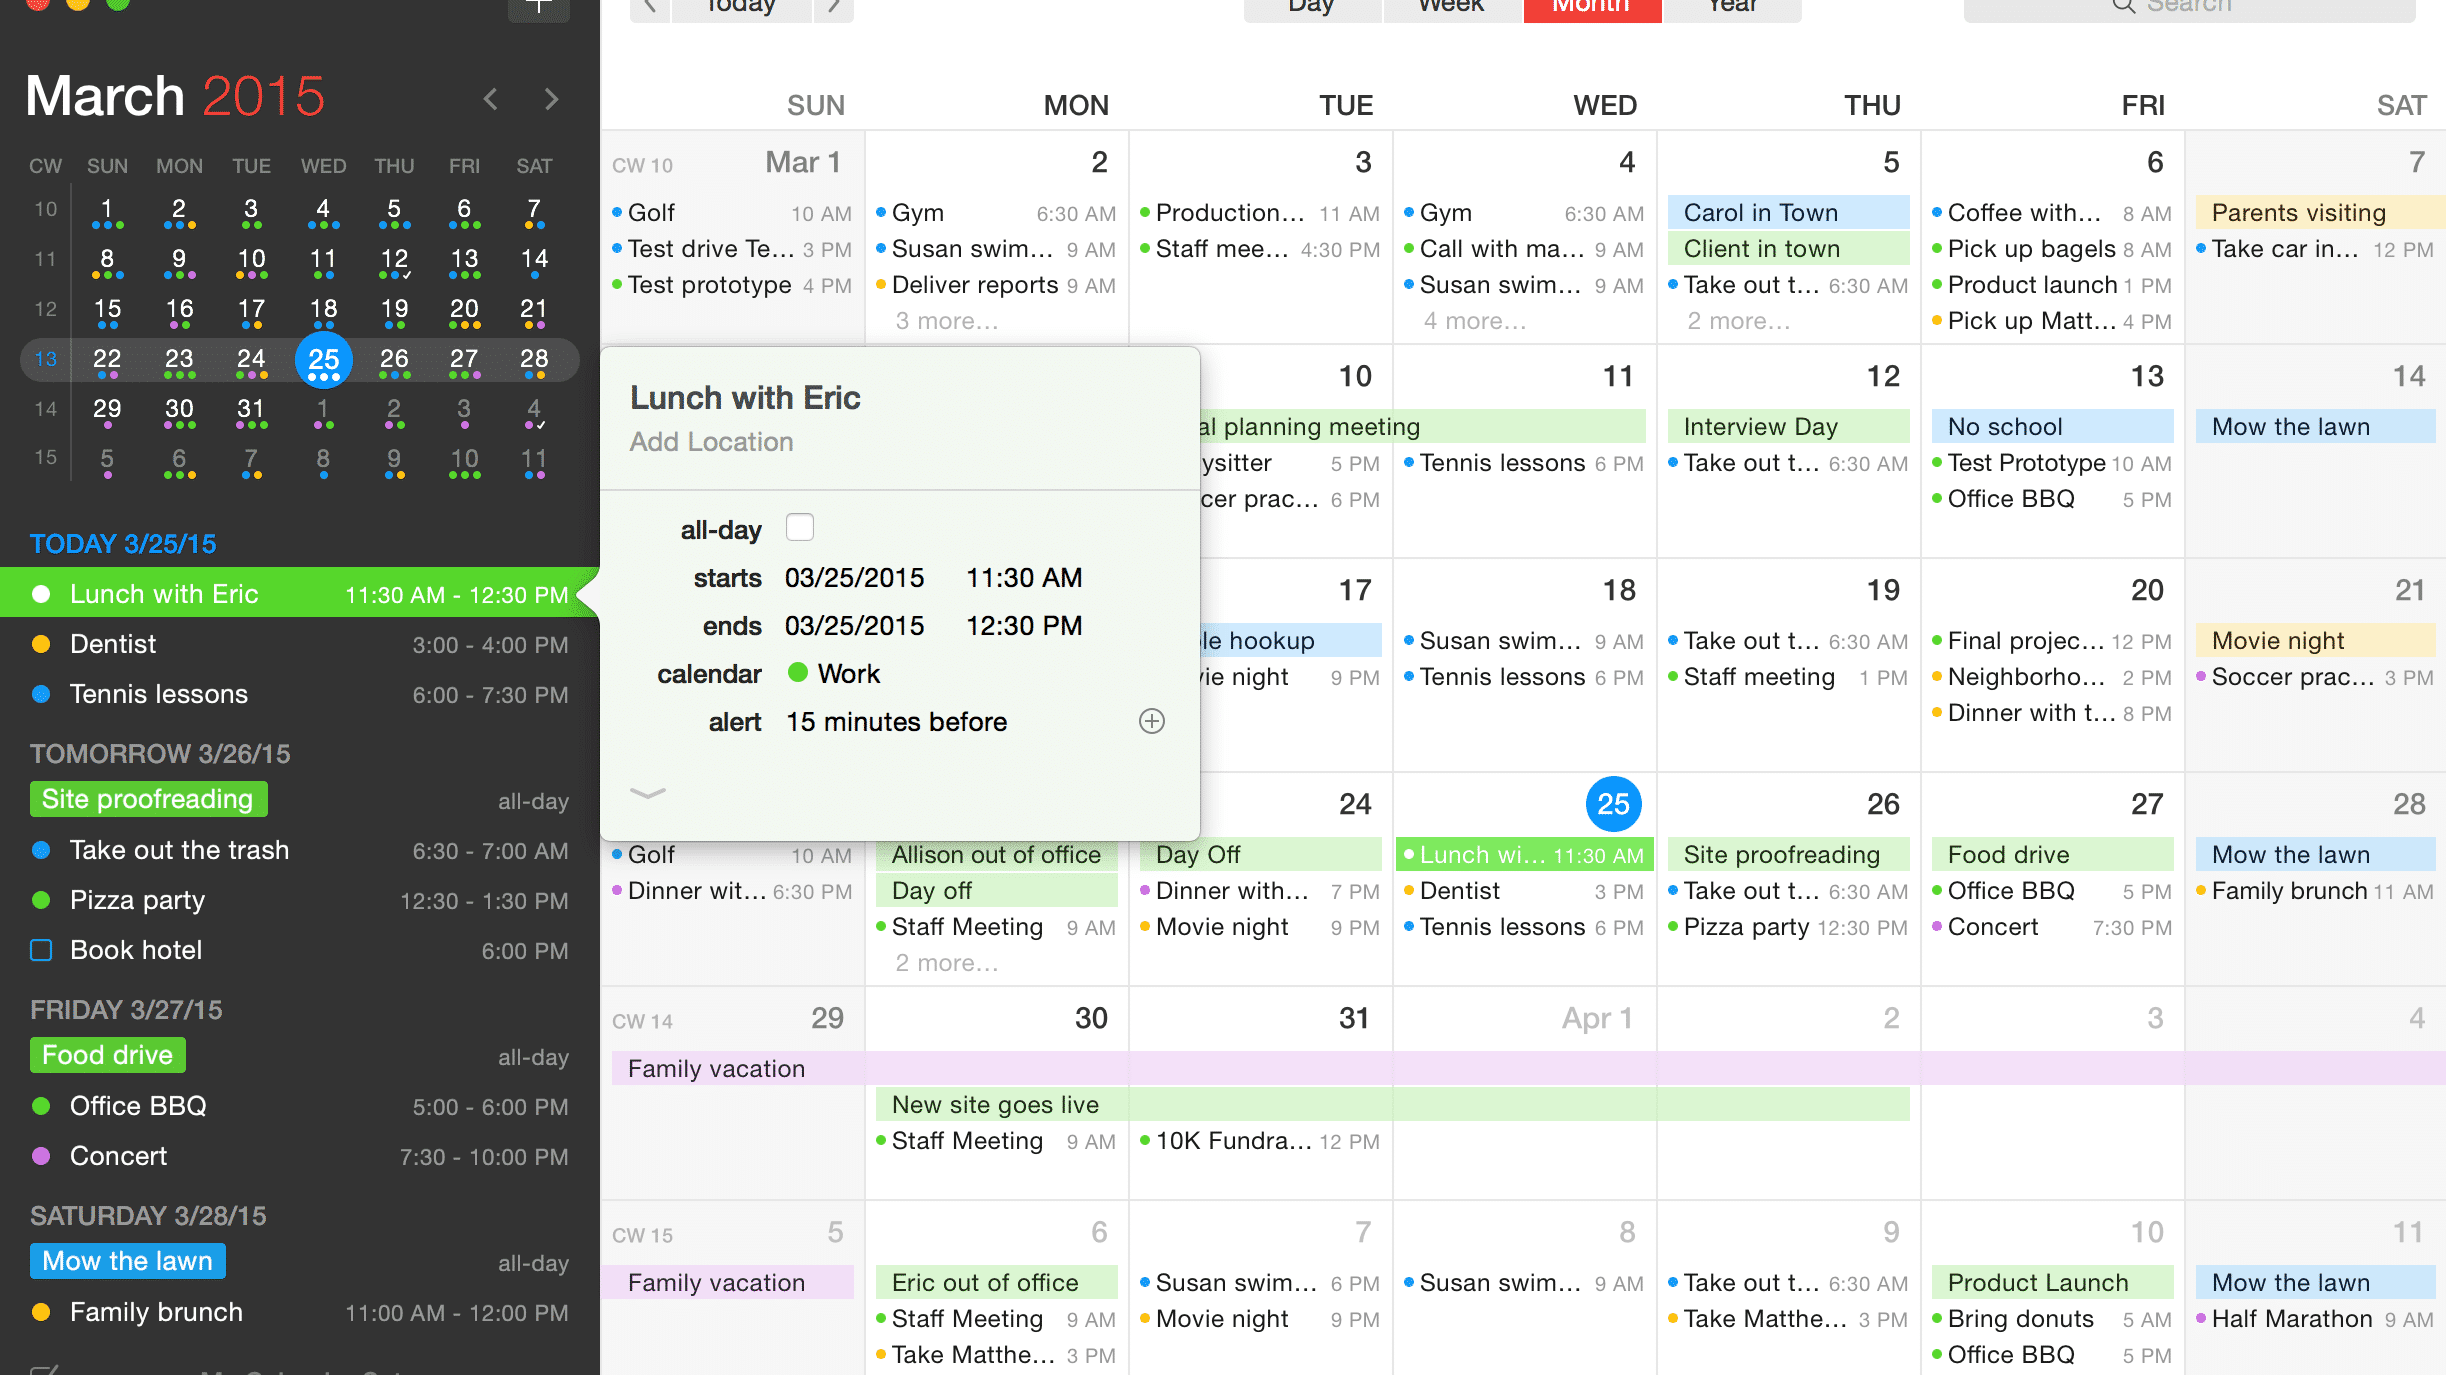 Mac: Großes Update für Kalender-App Fantastical